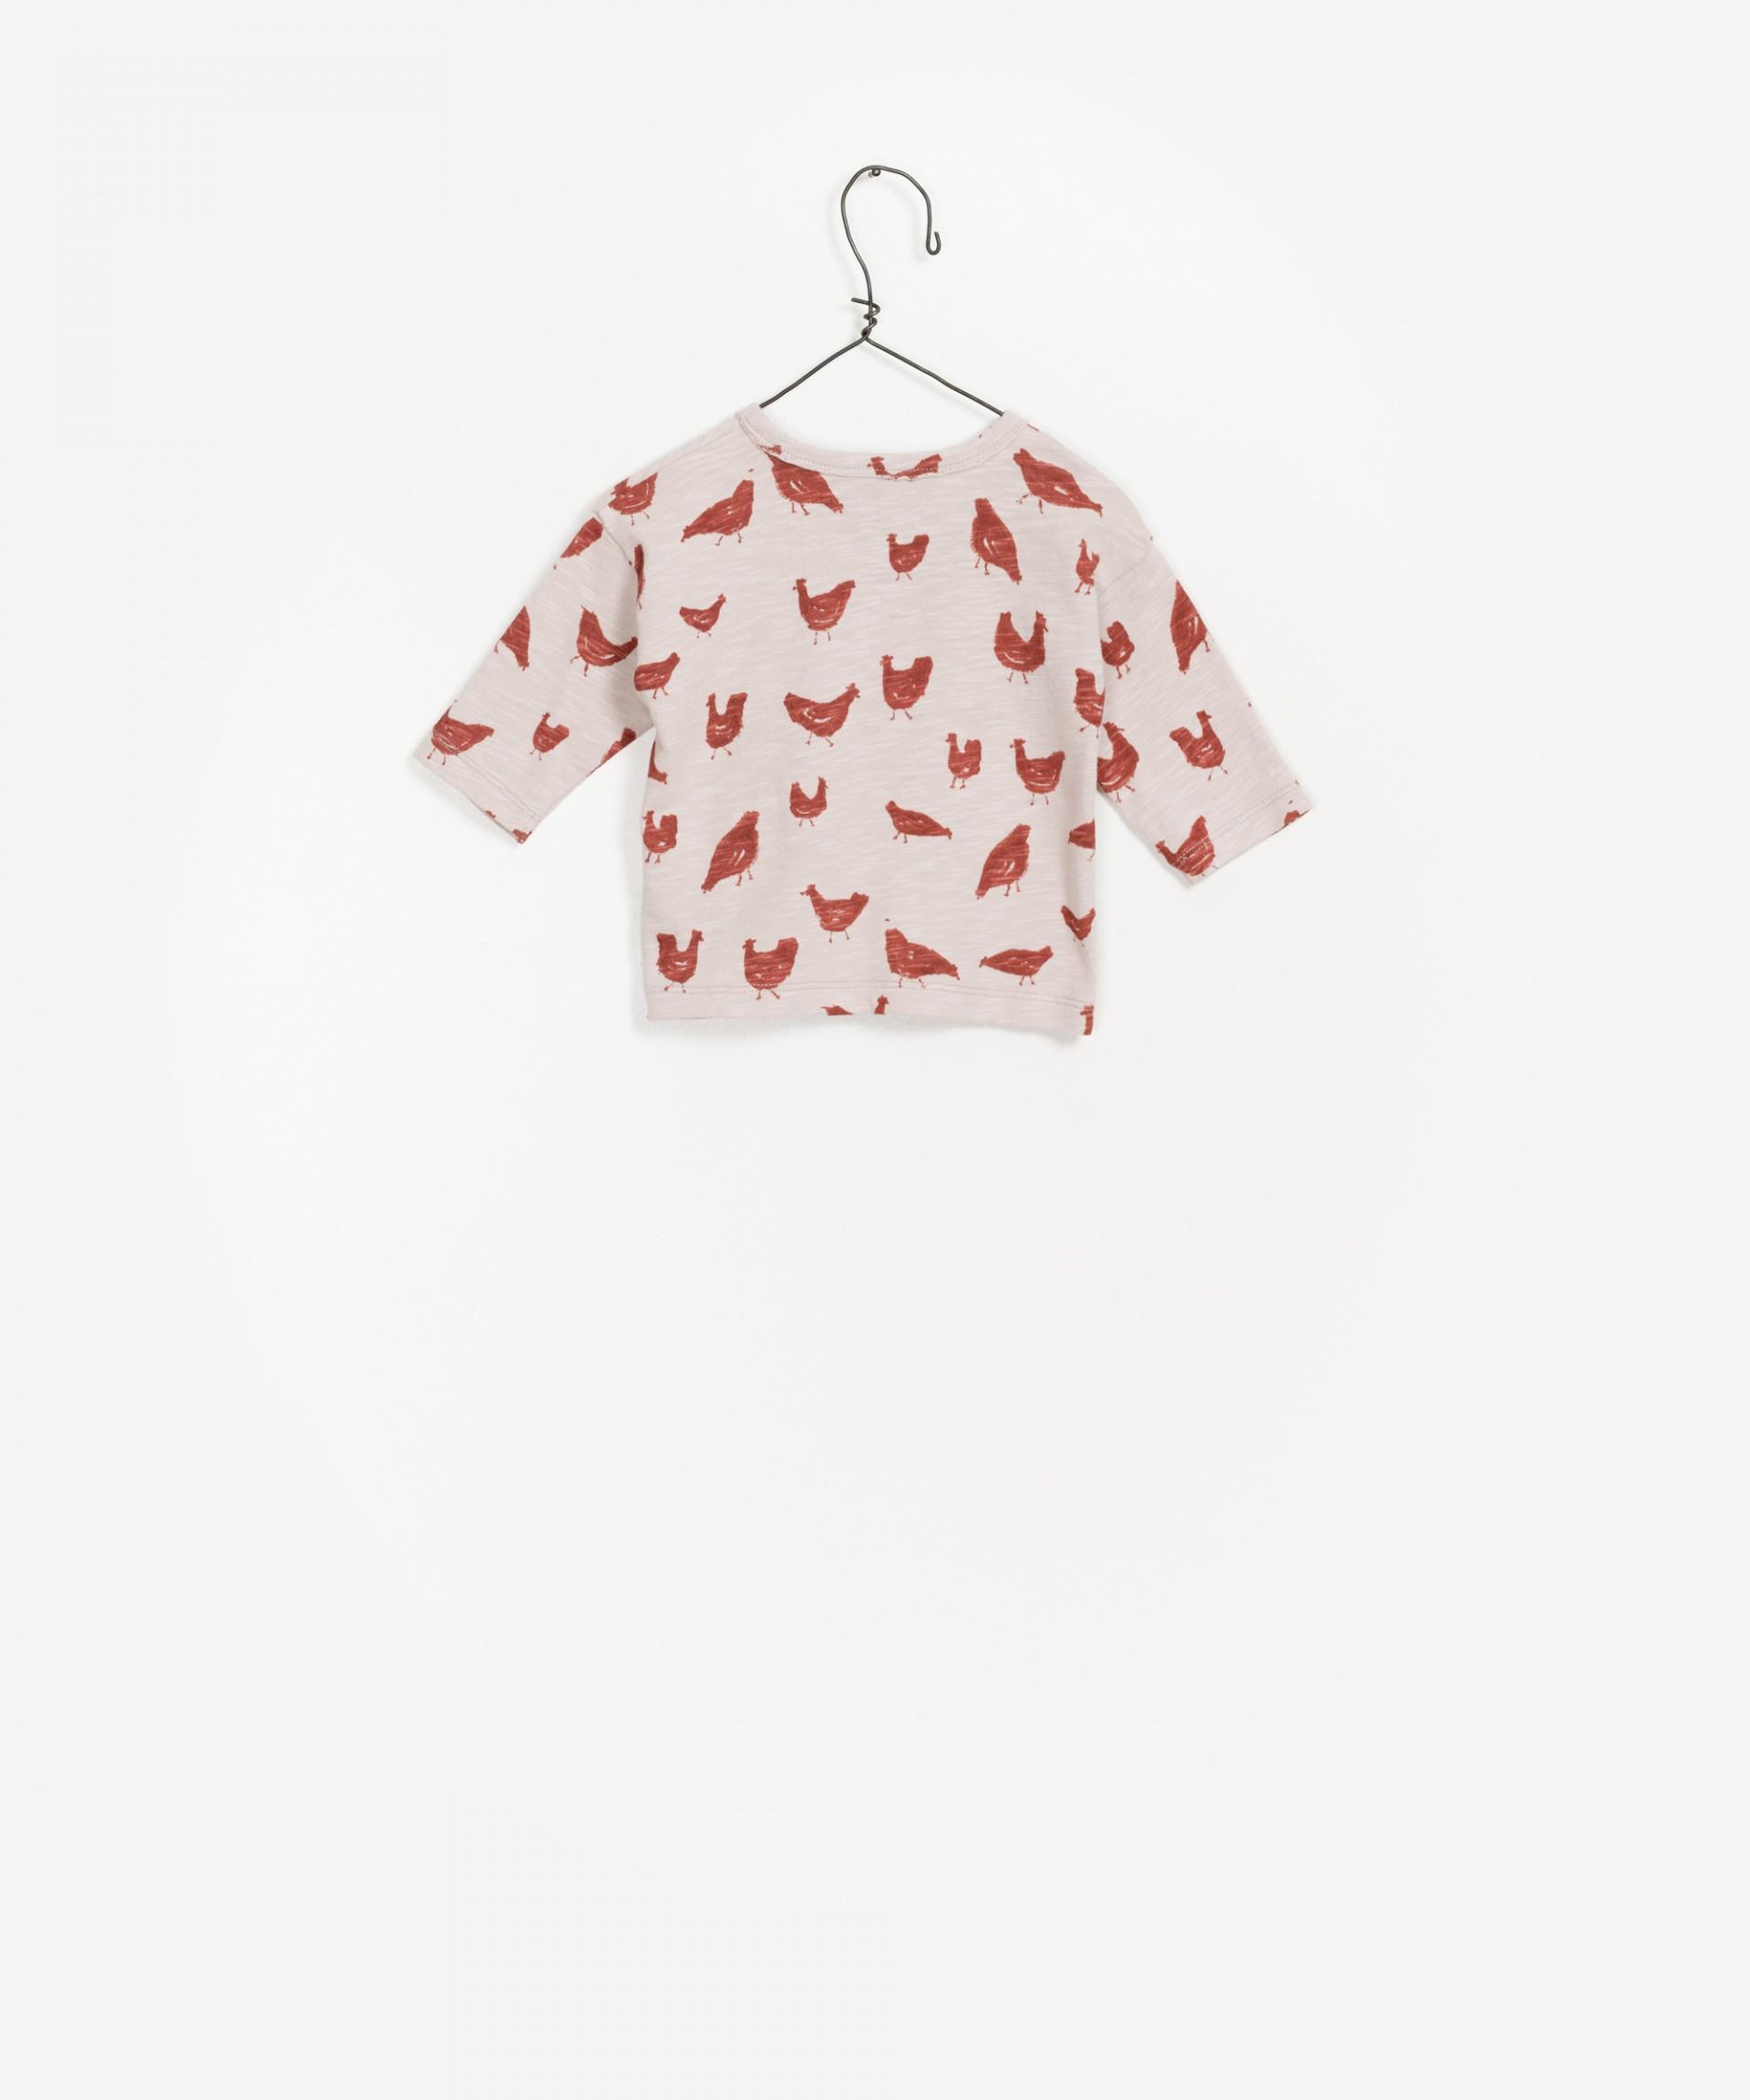 100% Organic Cotton Long Sleeve T-Shirt